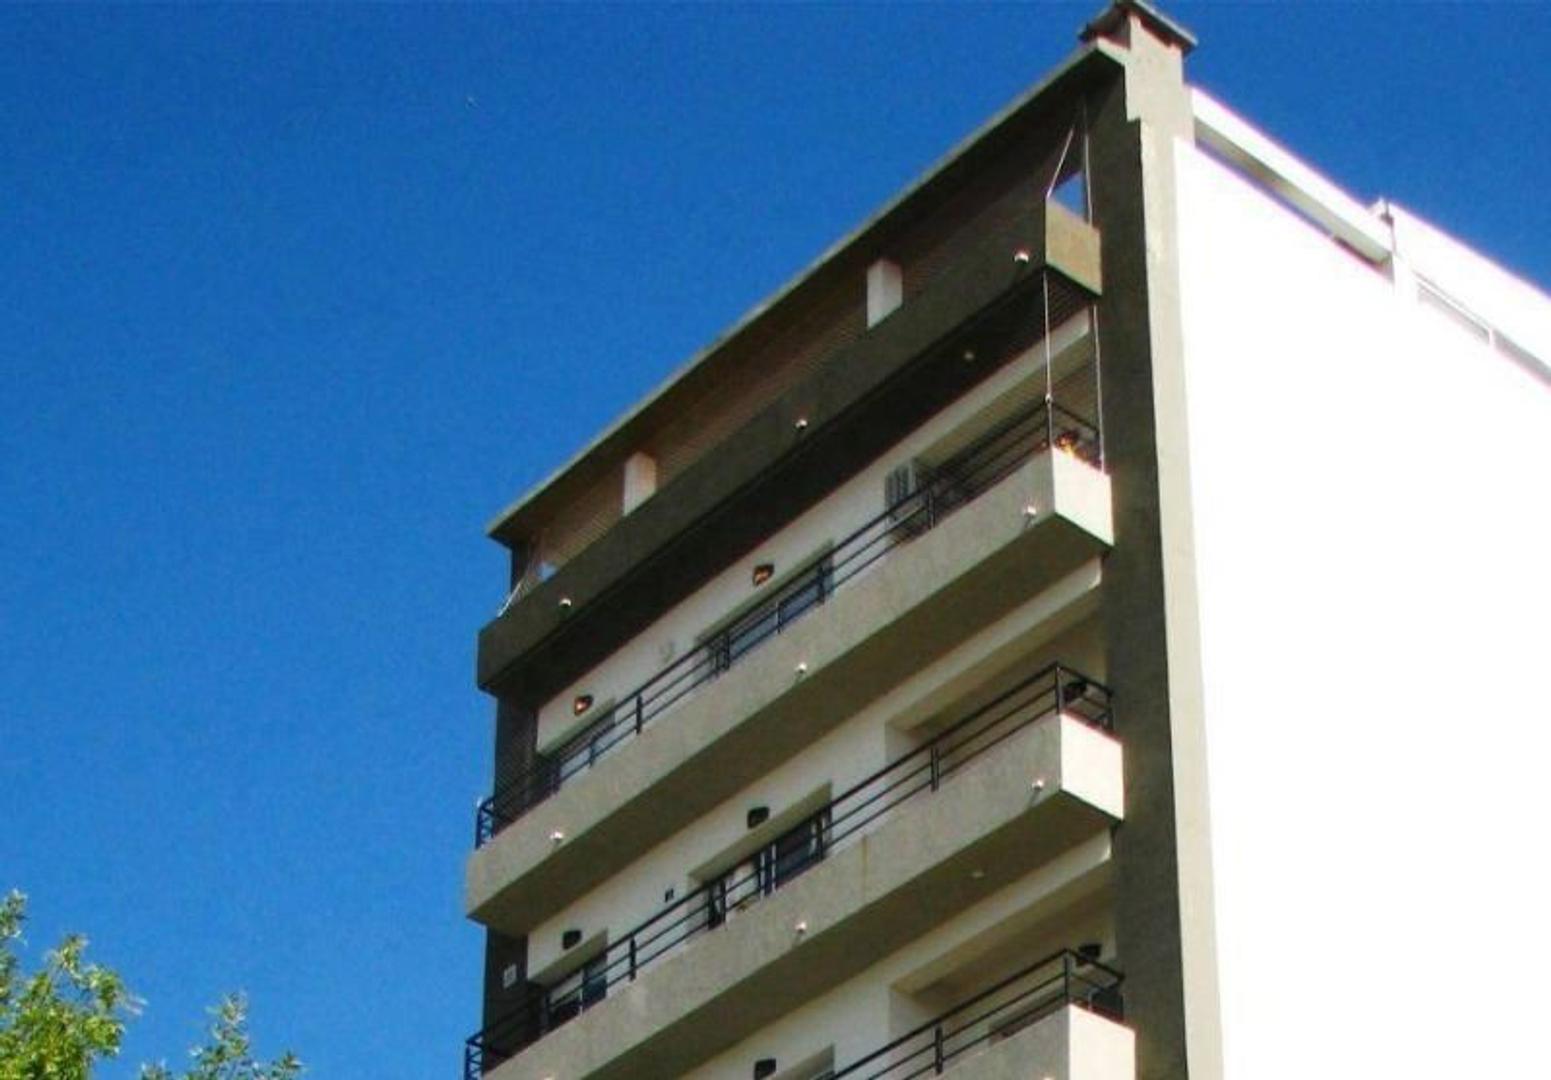 Excelente departamento tipo duplex dos dormitorios, terraza propia.